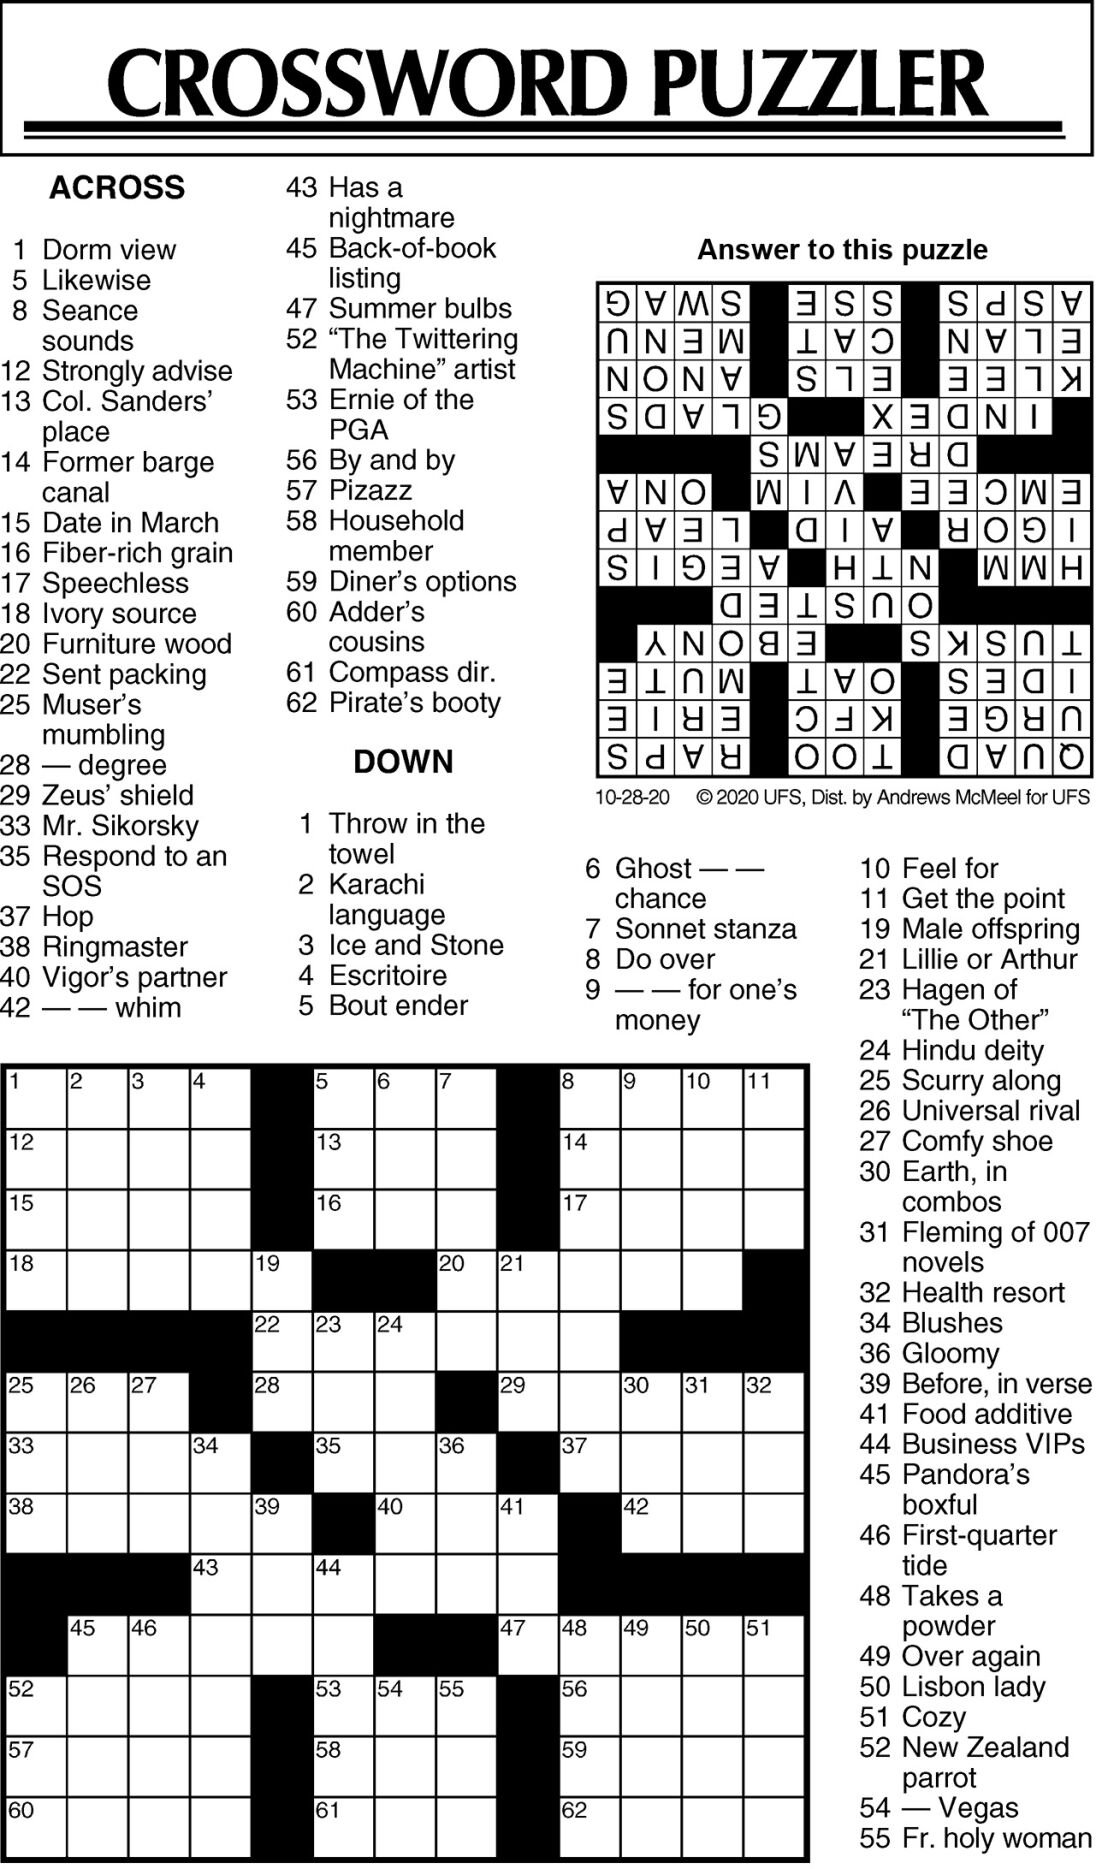 Crossword Puzzle 102820